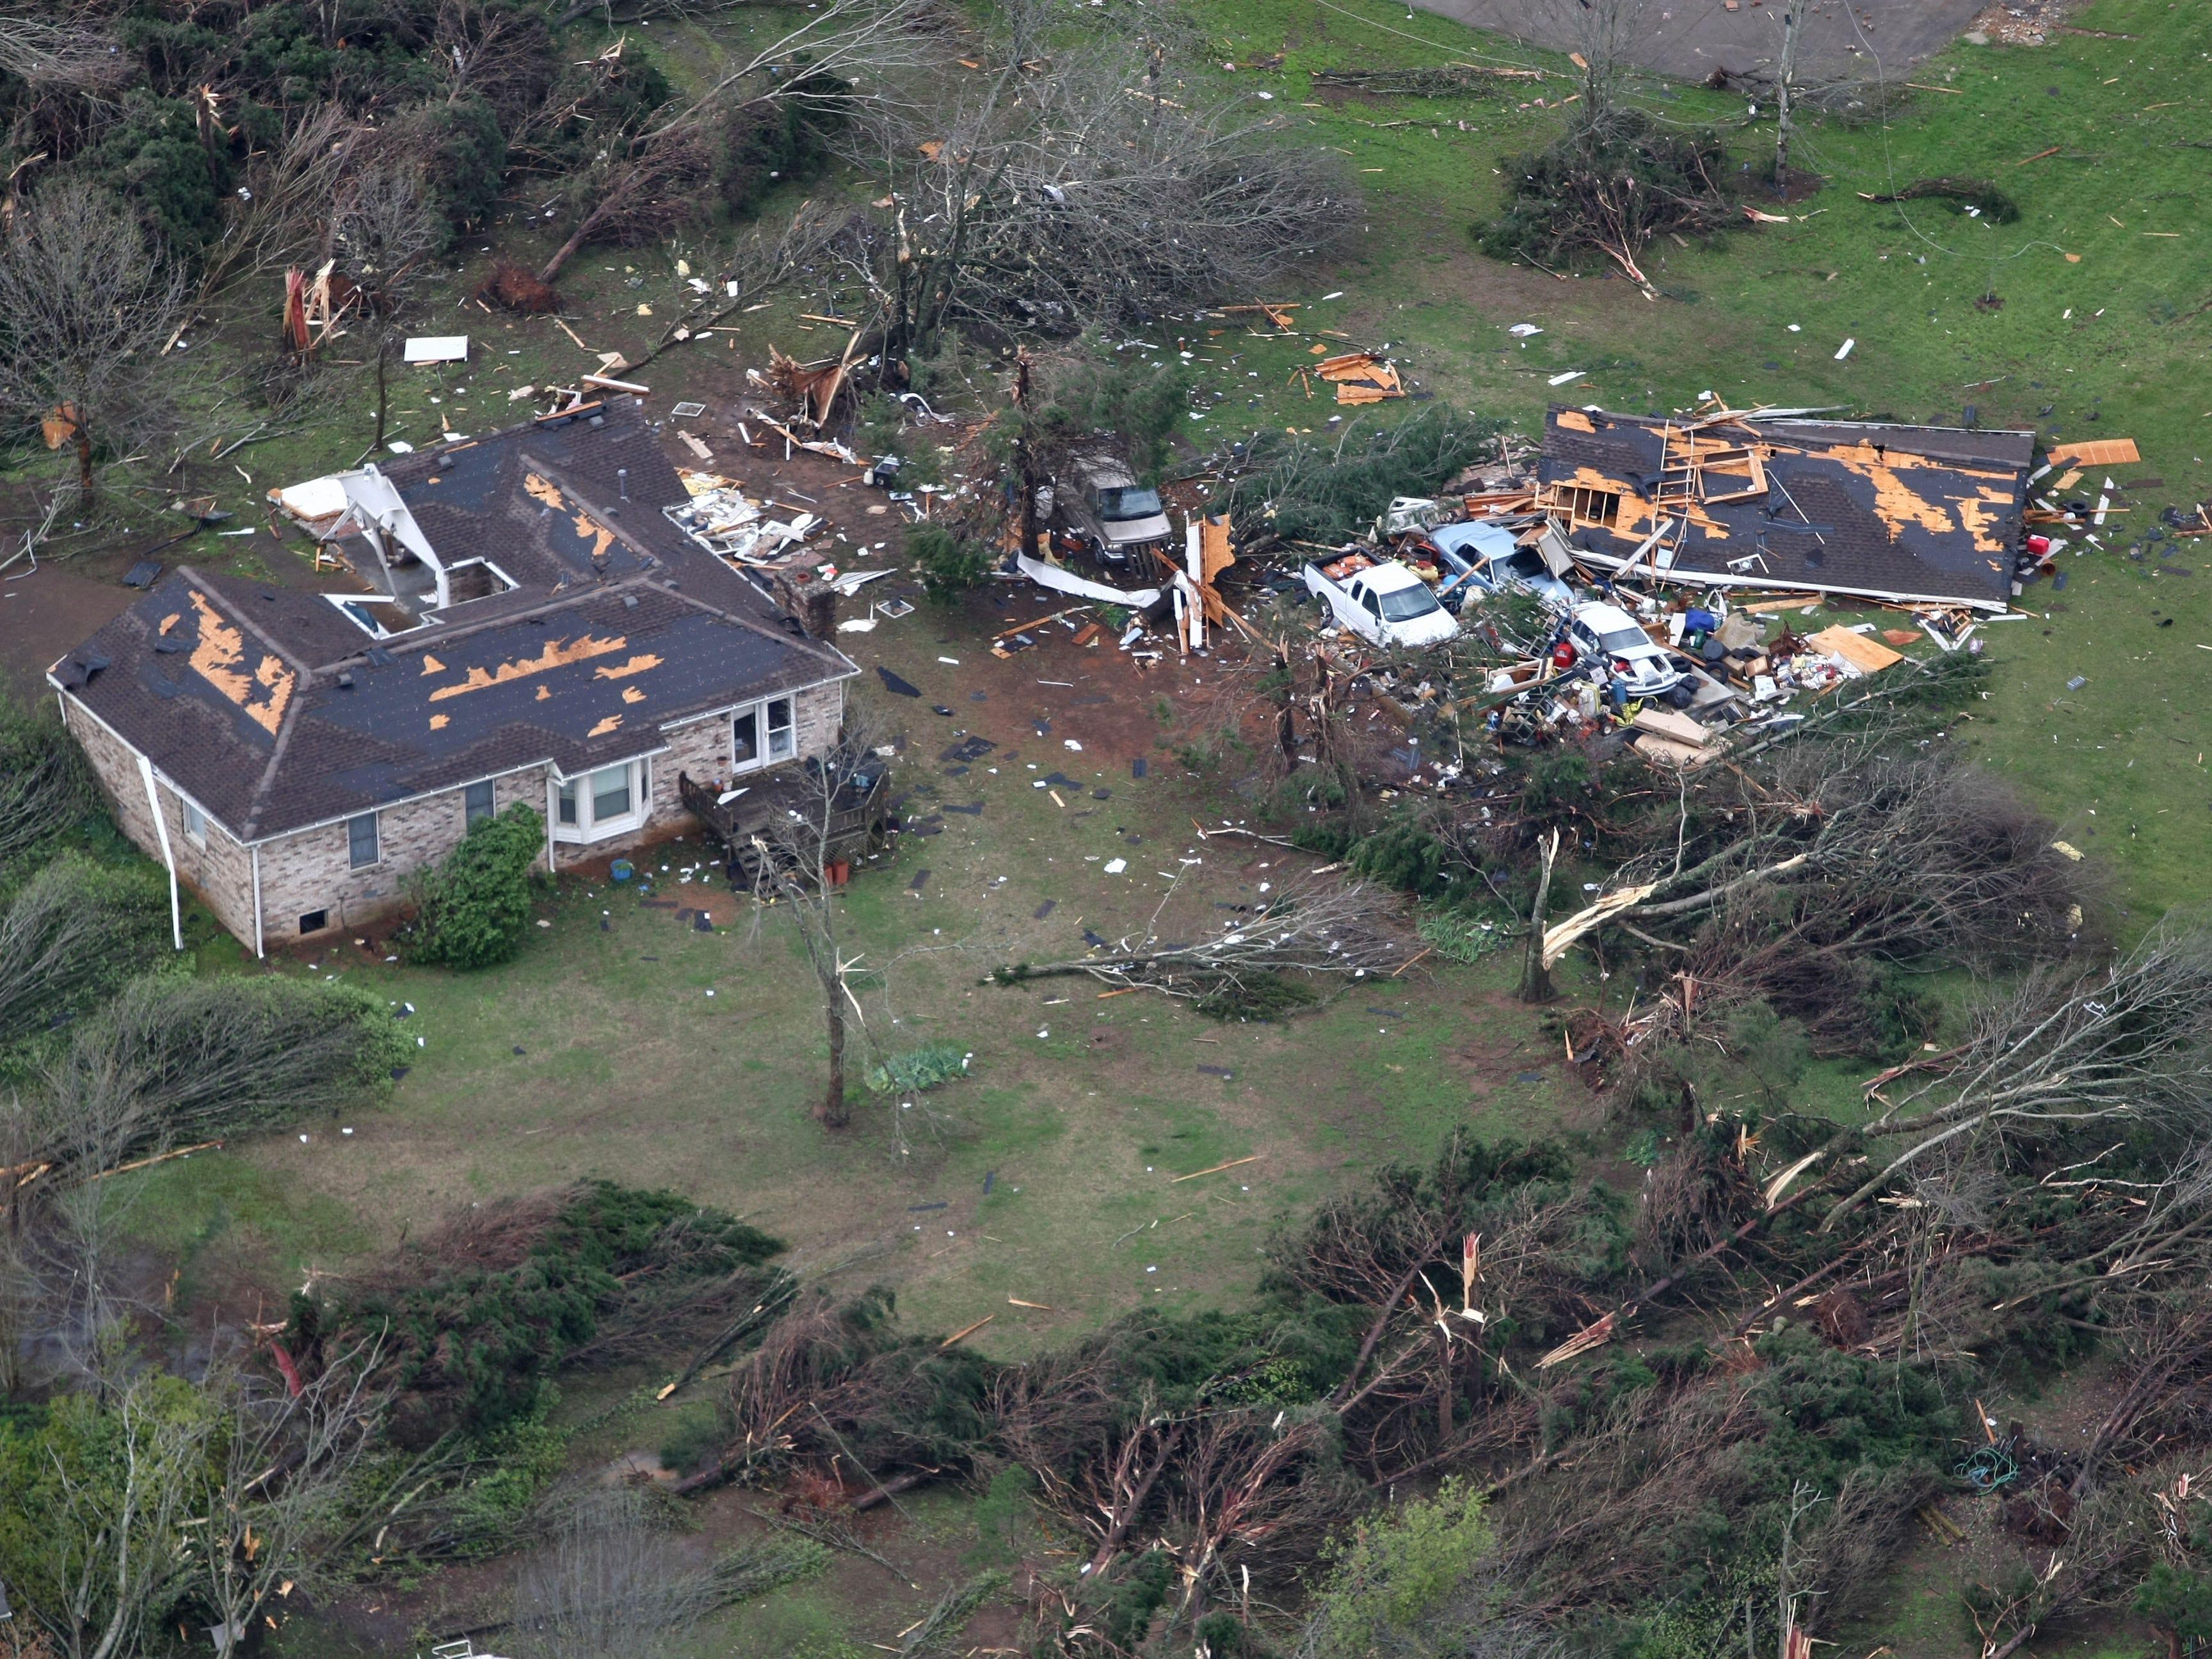 Aerial view of the tornado damage in Murfreesboro, Tenn. The tornado cut a 10 mile path through the city.  April 10, 2009 (photo GEORGE WALKER IV / THE TENNESSEAN)